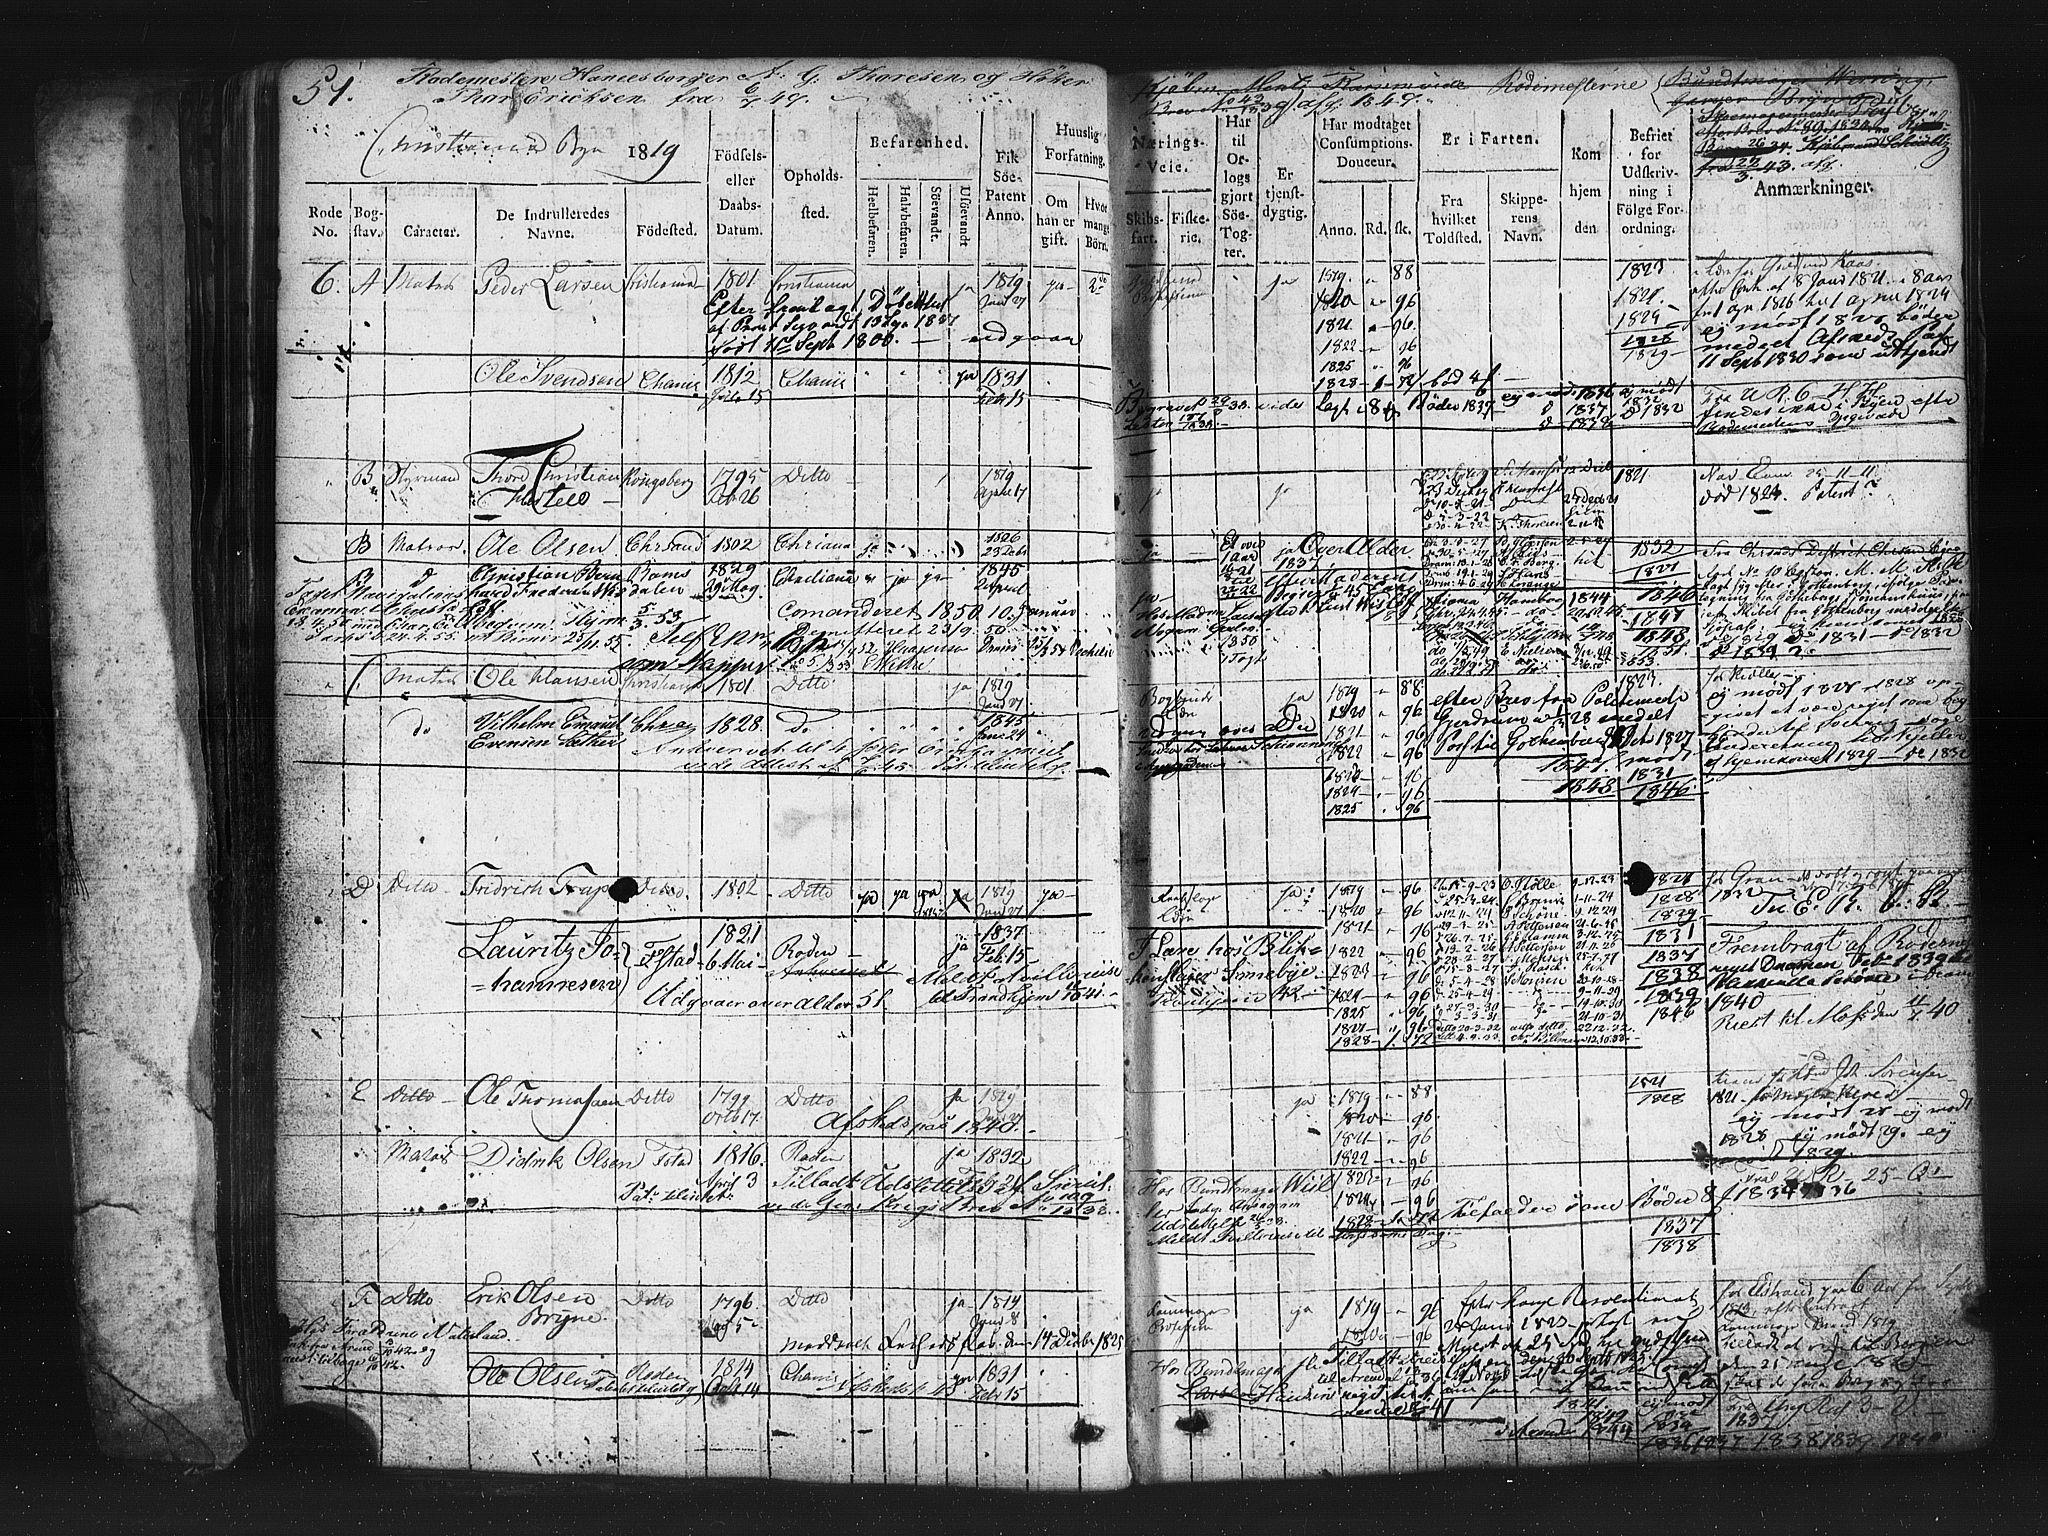 SAO, Oslo mønstringskontor, F/Fc/Fcb/L0001: Hovedrulle, 1819, s. 51